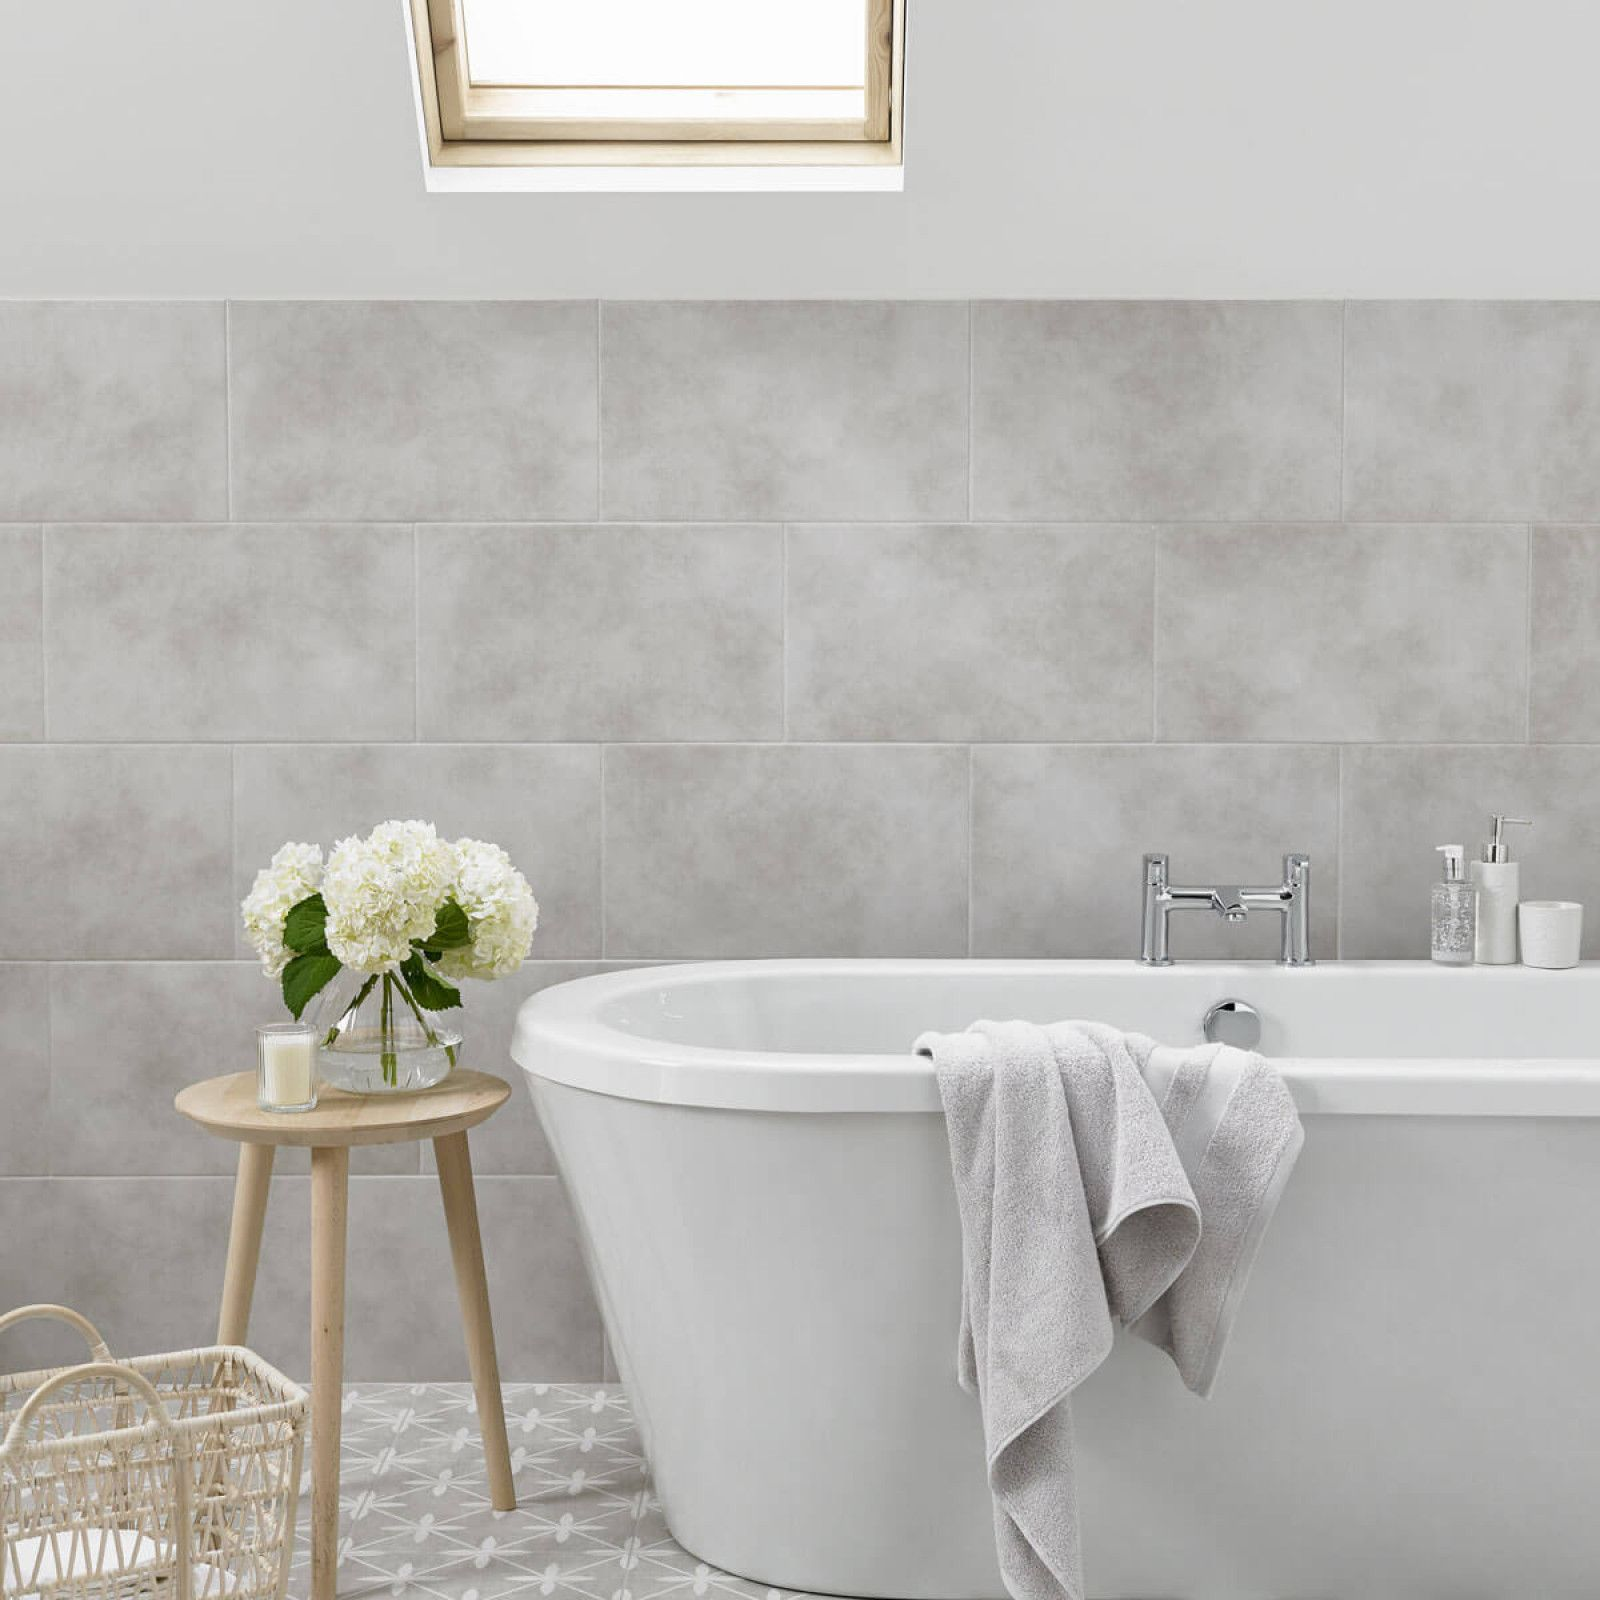 Laura Ashley Tiles Explore The Entire Collection Of Designer Tiles Bathroom Tiles Grey White Grey Bathroom Tiles Grey Bathrooms